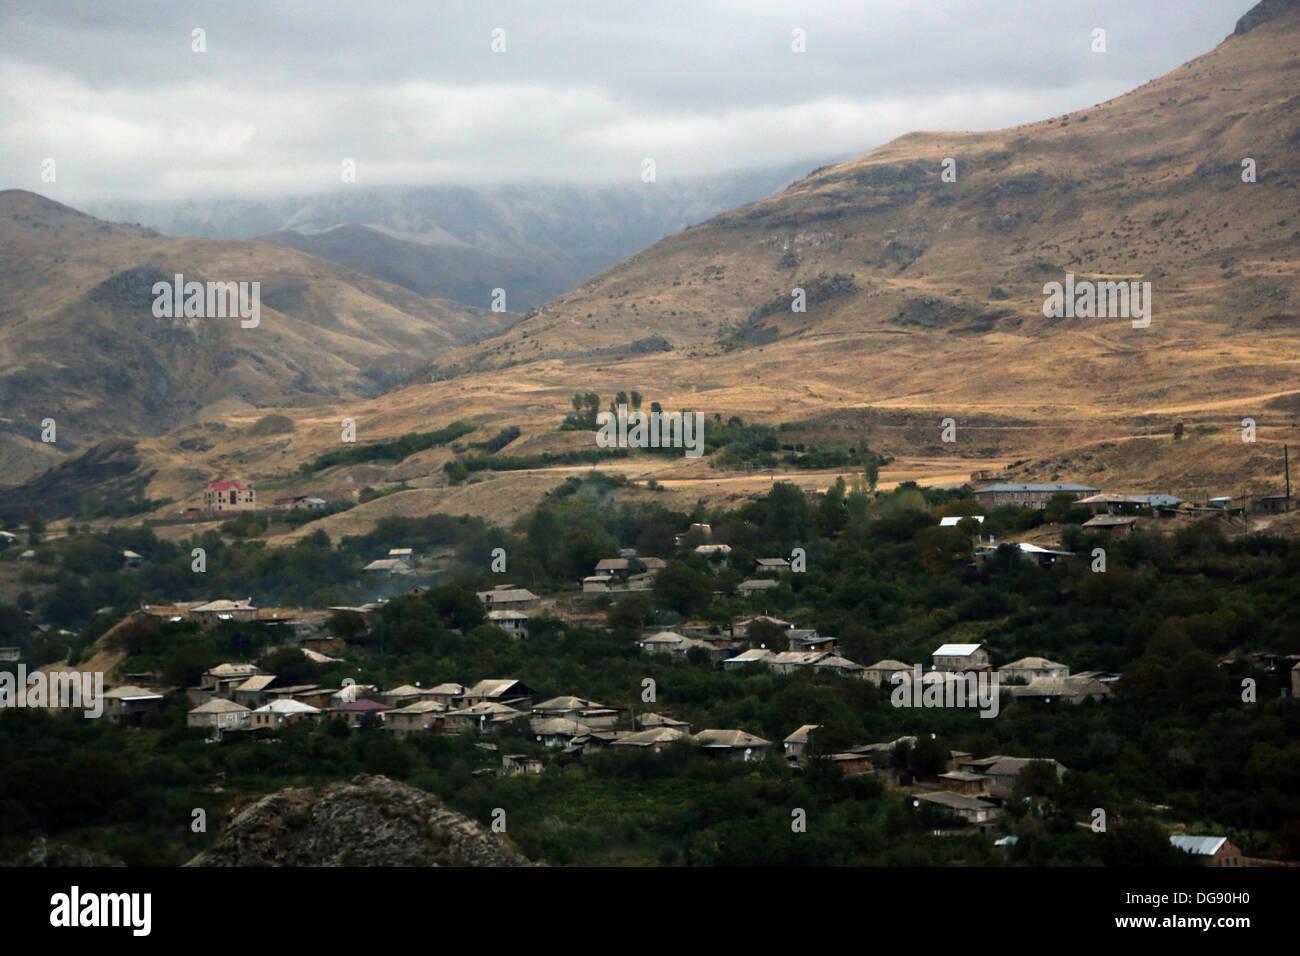 Nagorno Karabakh, landscapes - Stock Image